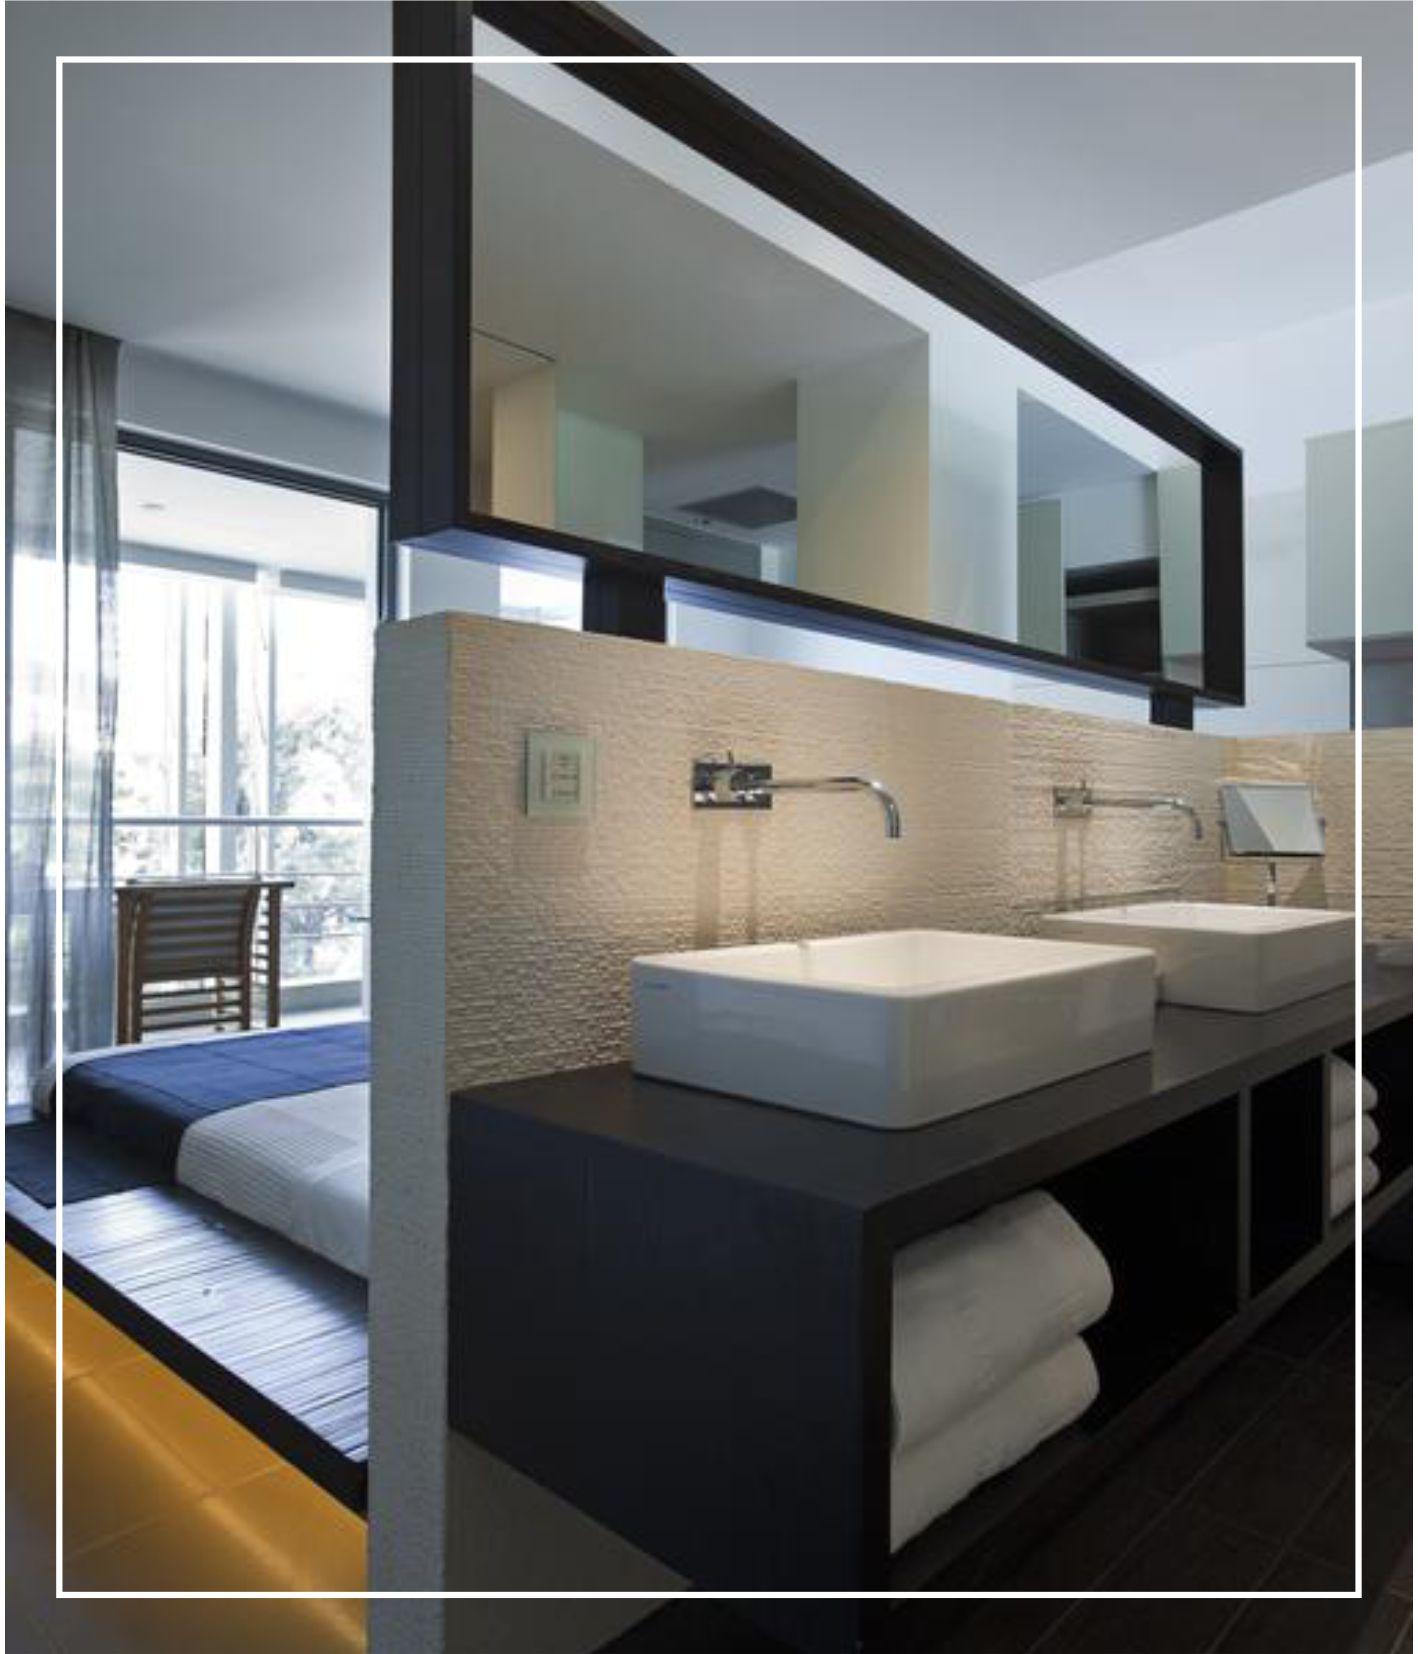 Paraskevi-interior-design-images-28